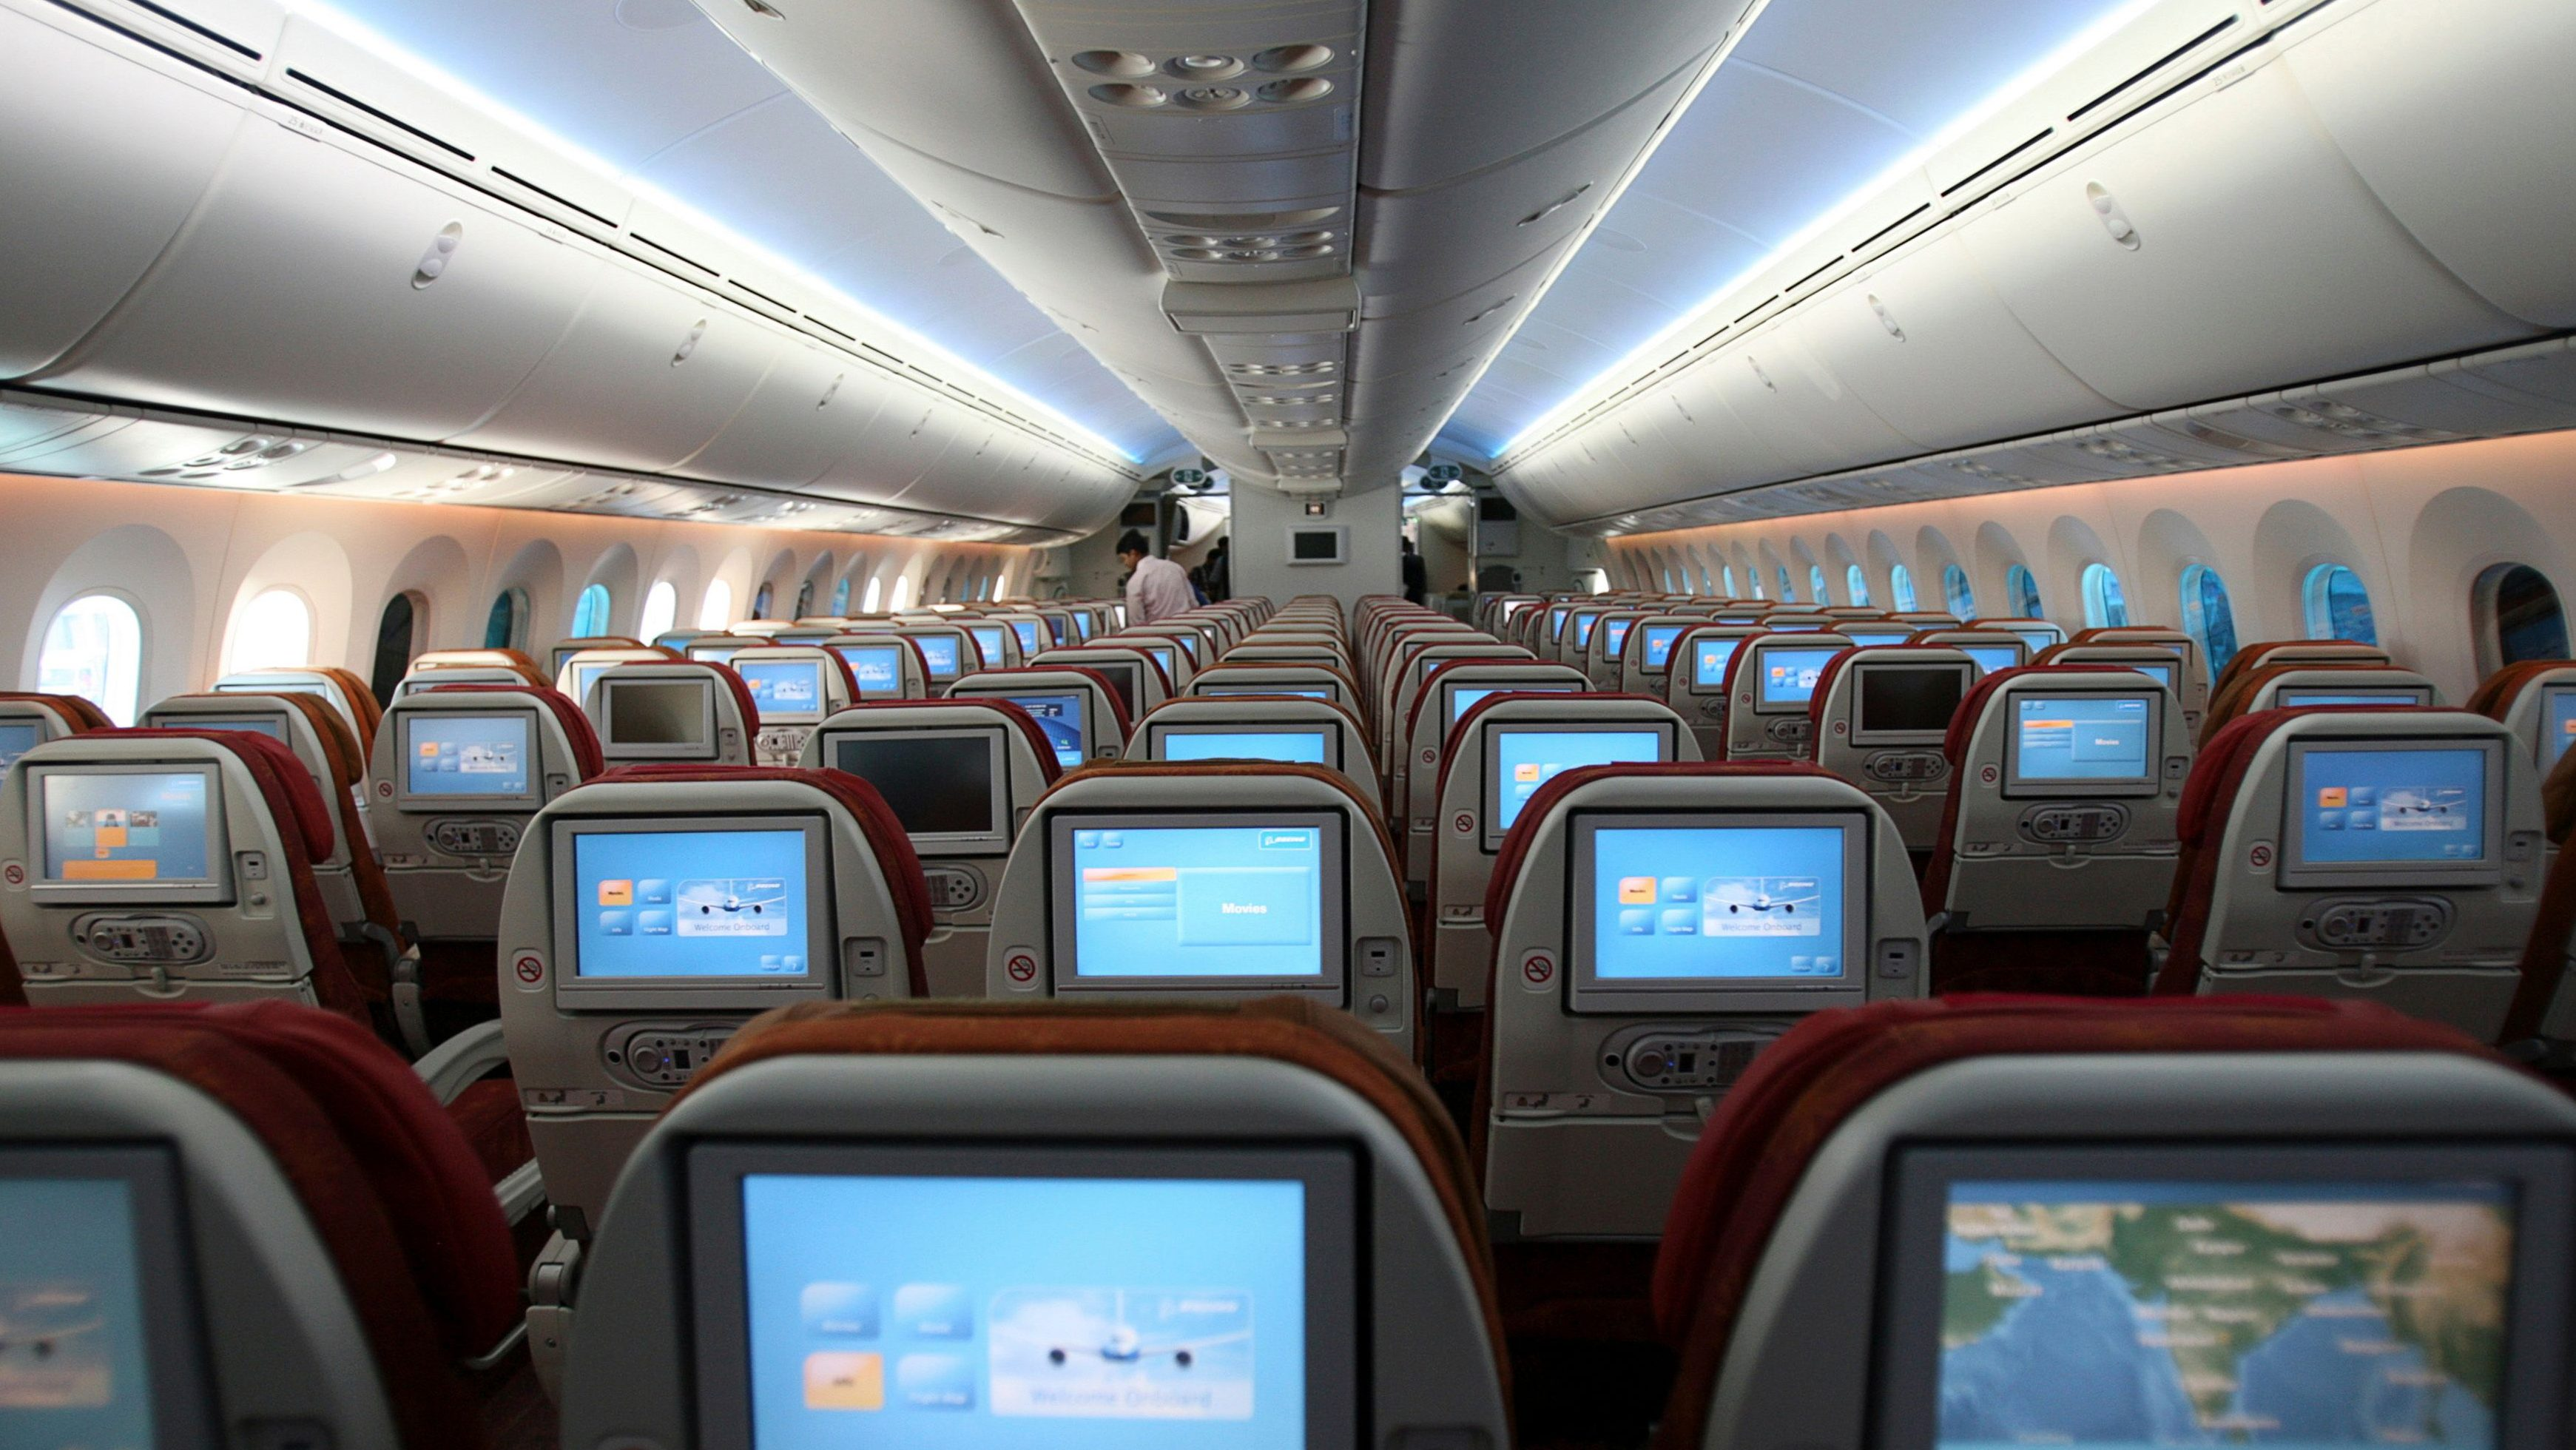 Delta cutting seat recline on domestic flights